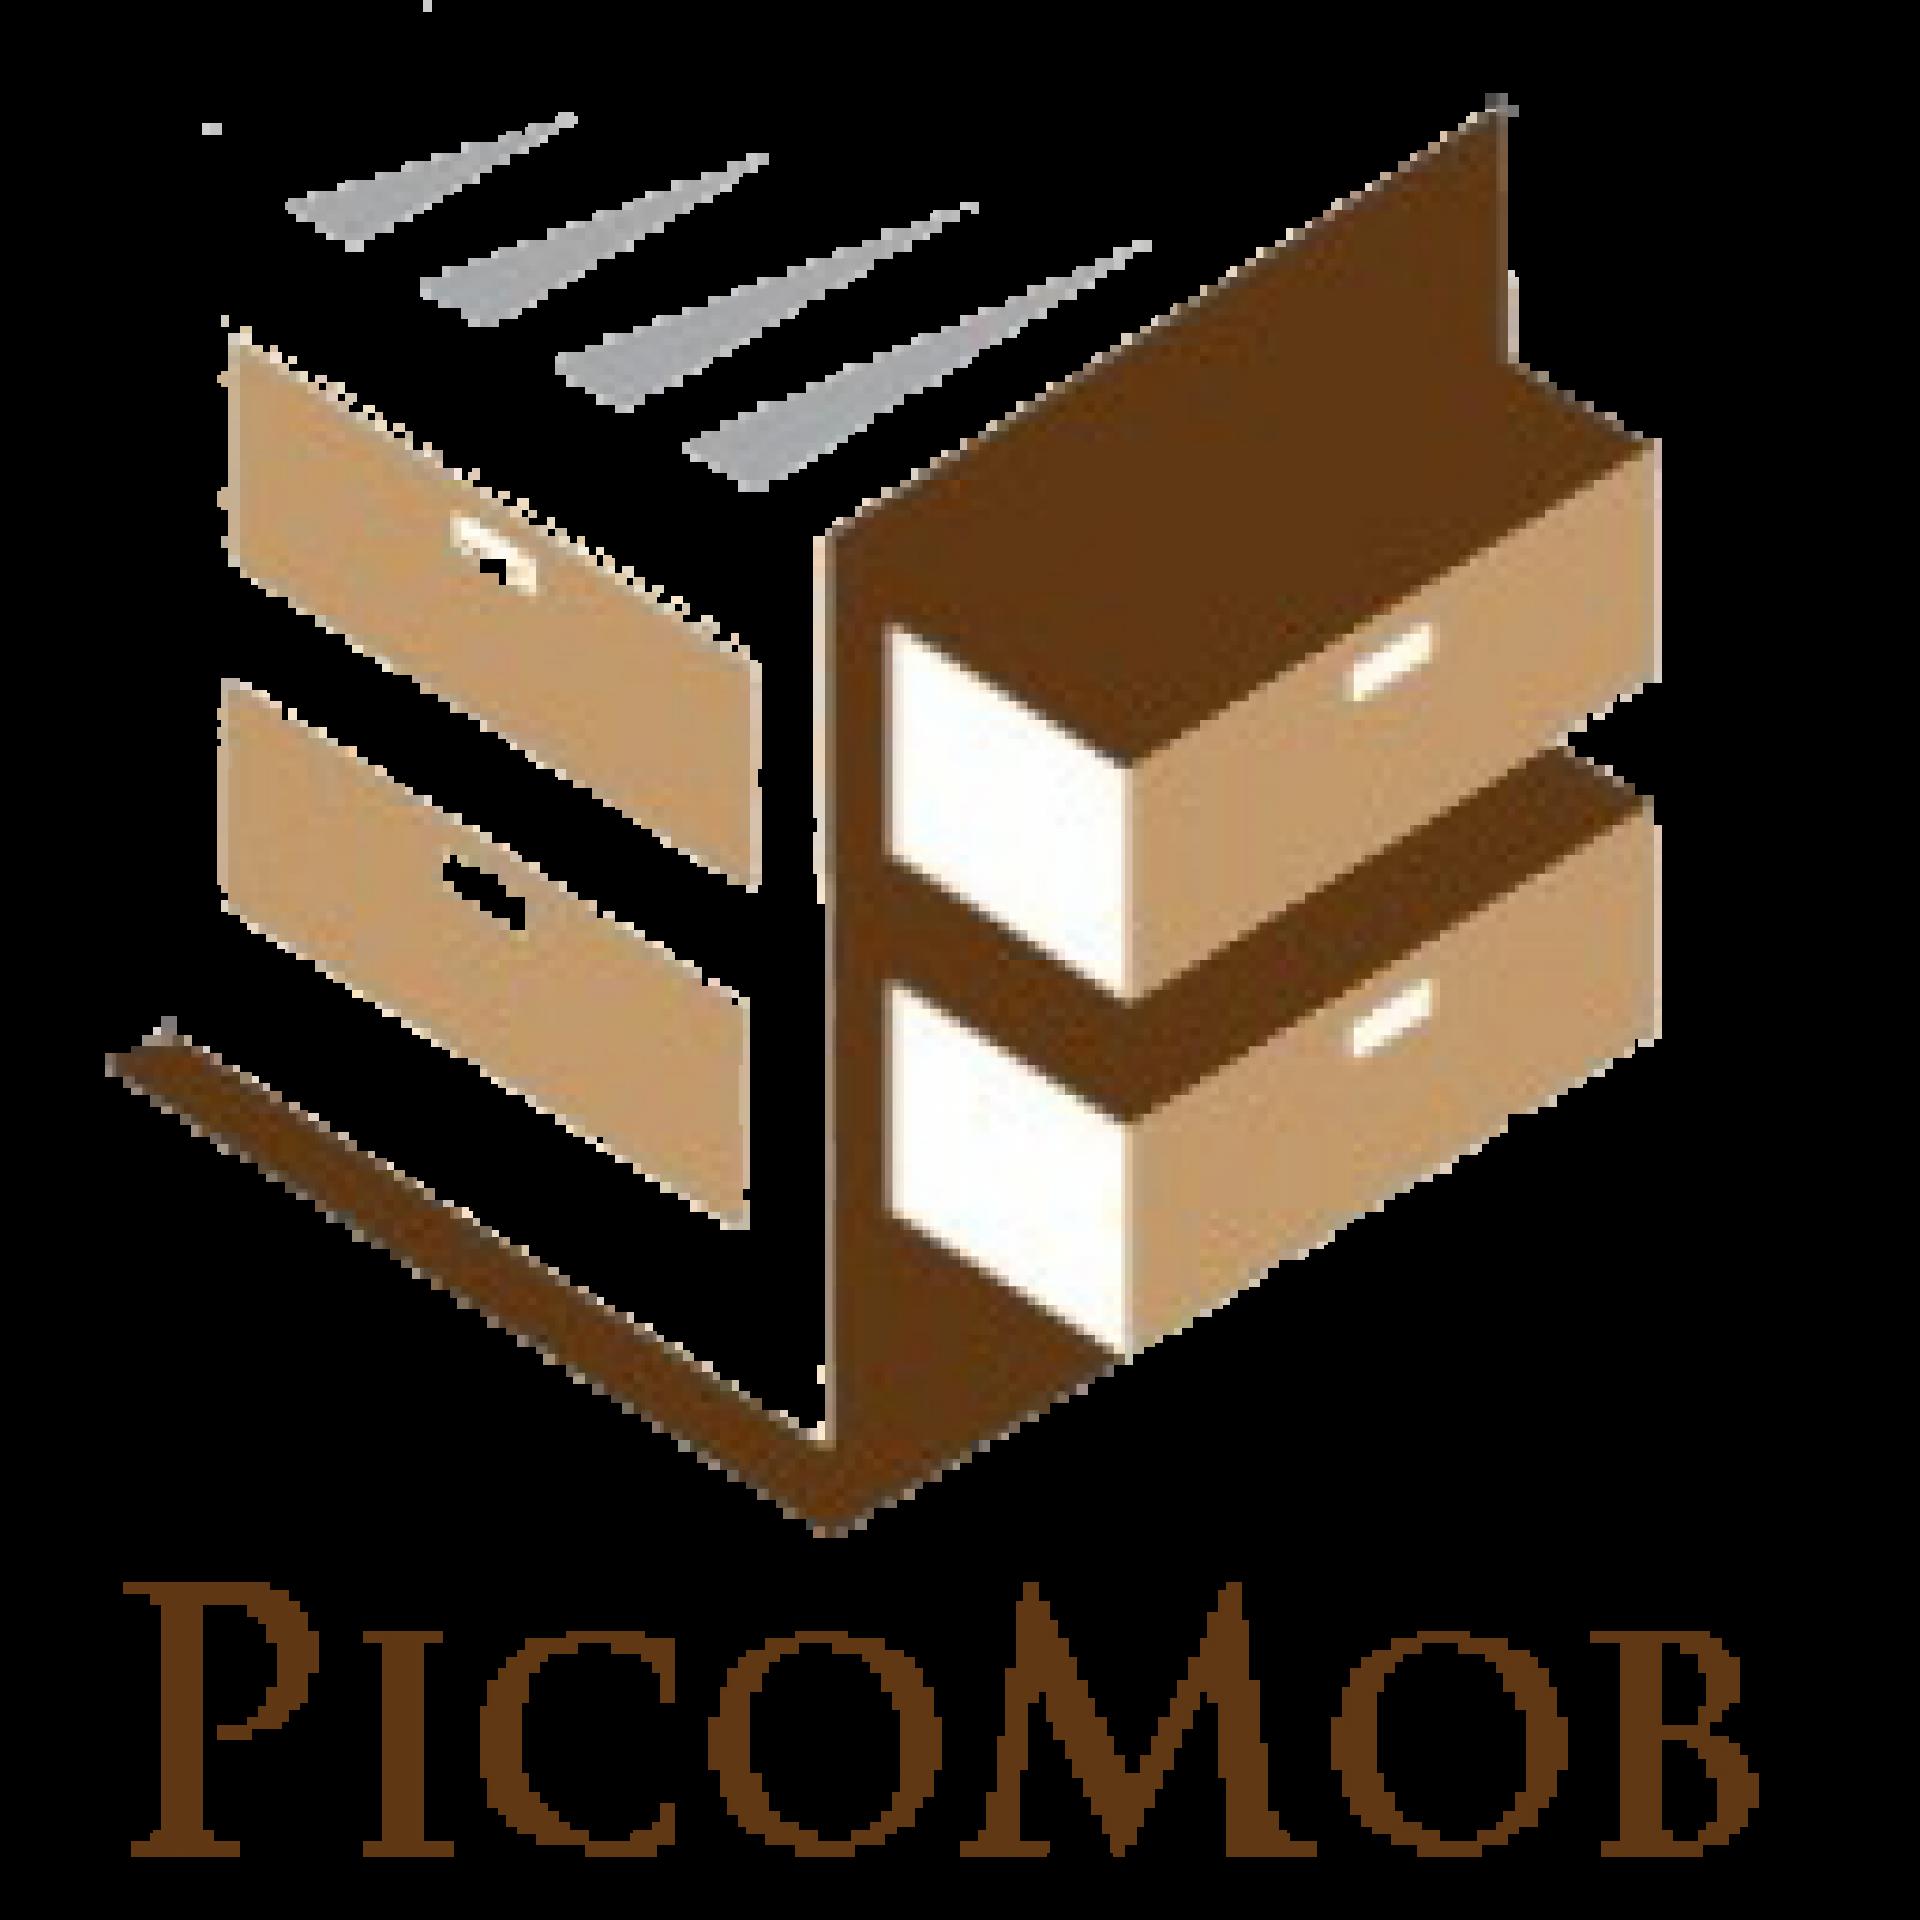 PicoMob